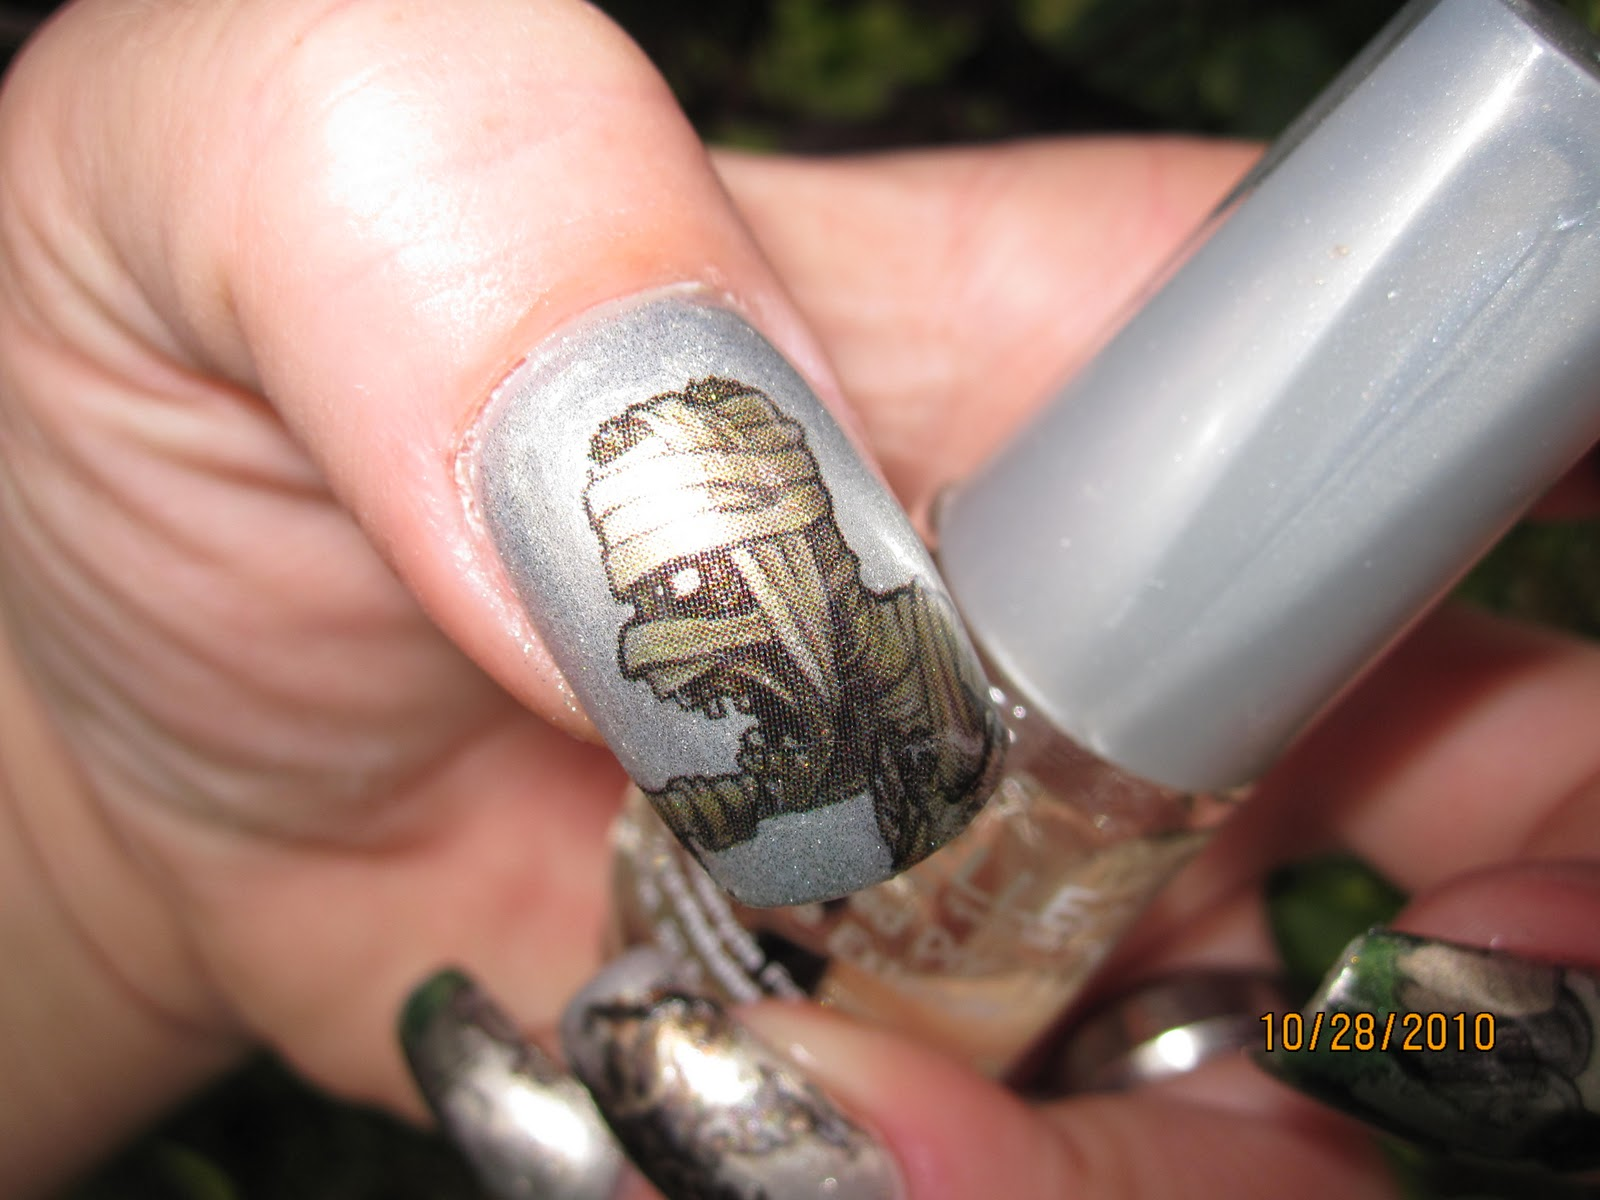 Glammed-up: FCC 34 EDIT! spooky tattoos as nail art!